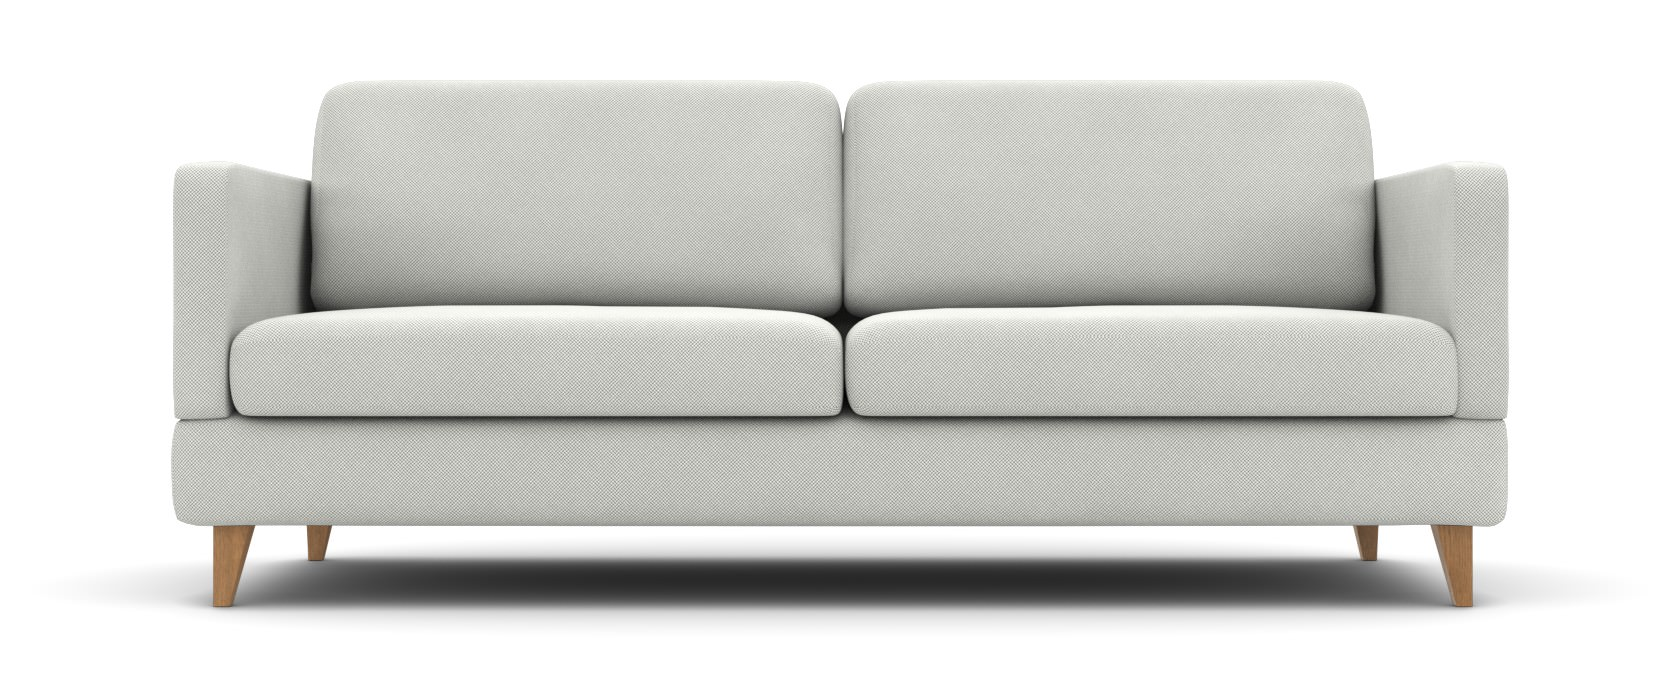 Тримісний диван Bruno Club - Pufetto